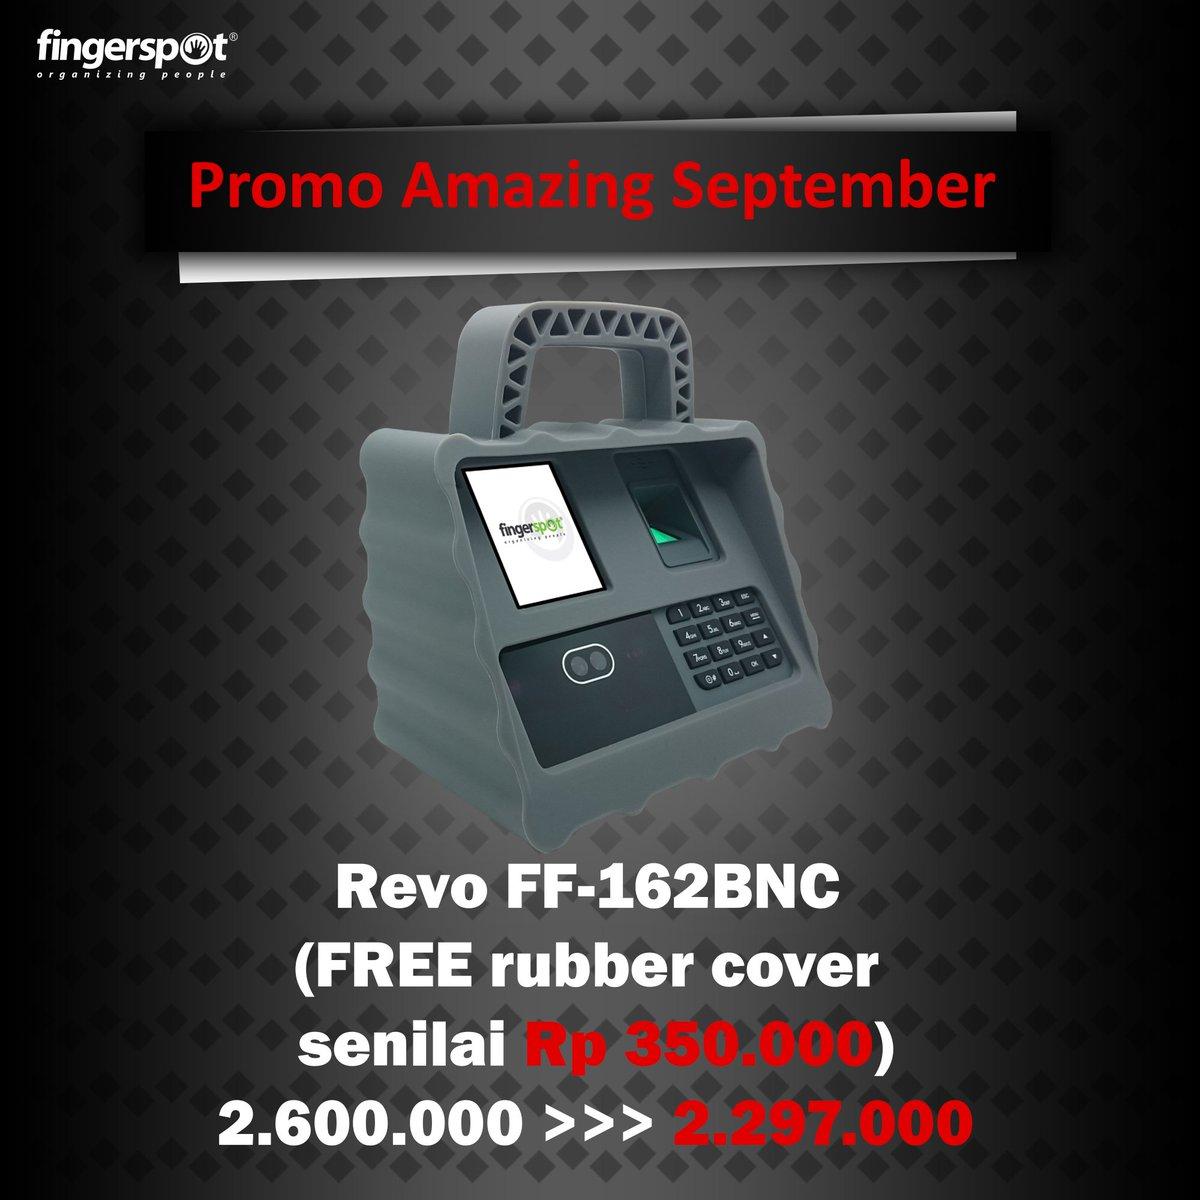 SALE! Grab it fast! #Promo #promote #Promotion #branding #grab #selling #marketing #marketingonline #September #technology #amazing #Offer<br>http://pic.twitter.com/sdGQbaxqbw